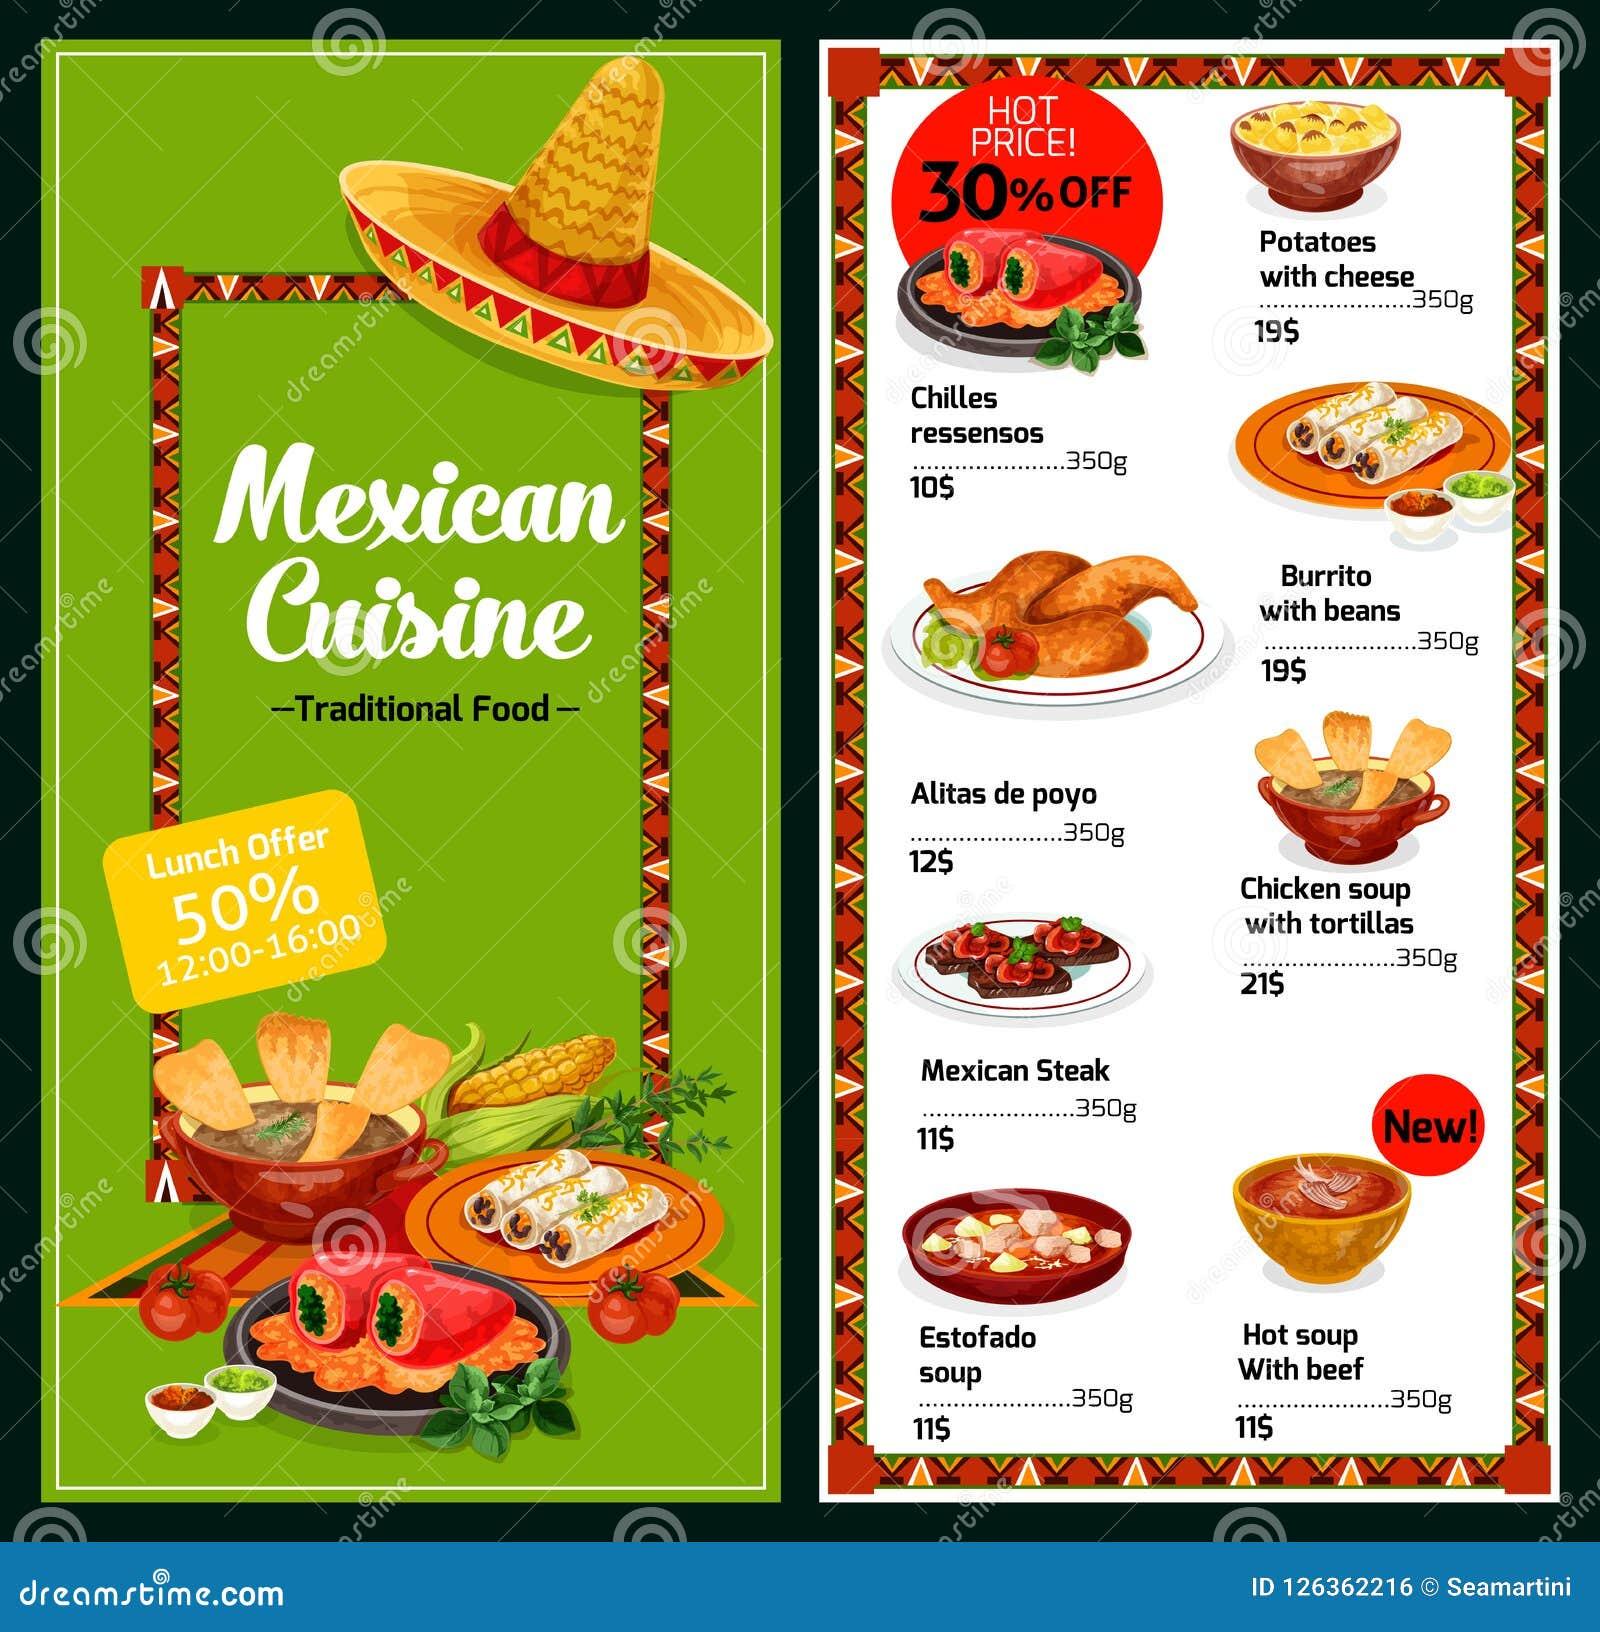 Mexican Restaurant Menu Stock Illustrations 9 644 Mexican Restaurant Menu Stock Illustrations Vectors Clipart Dreamstime